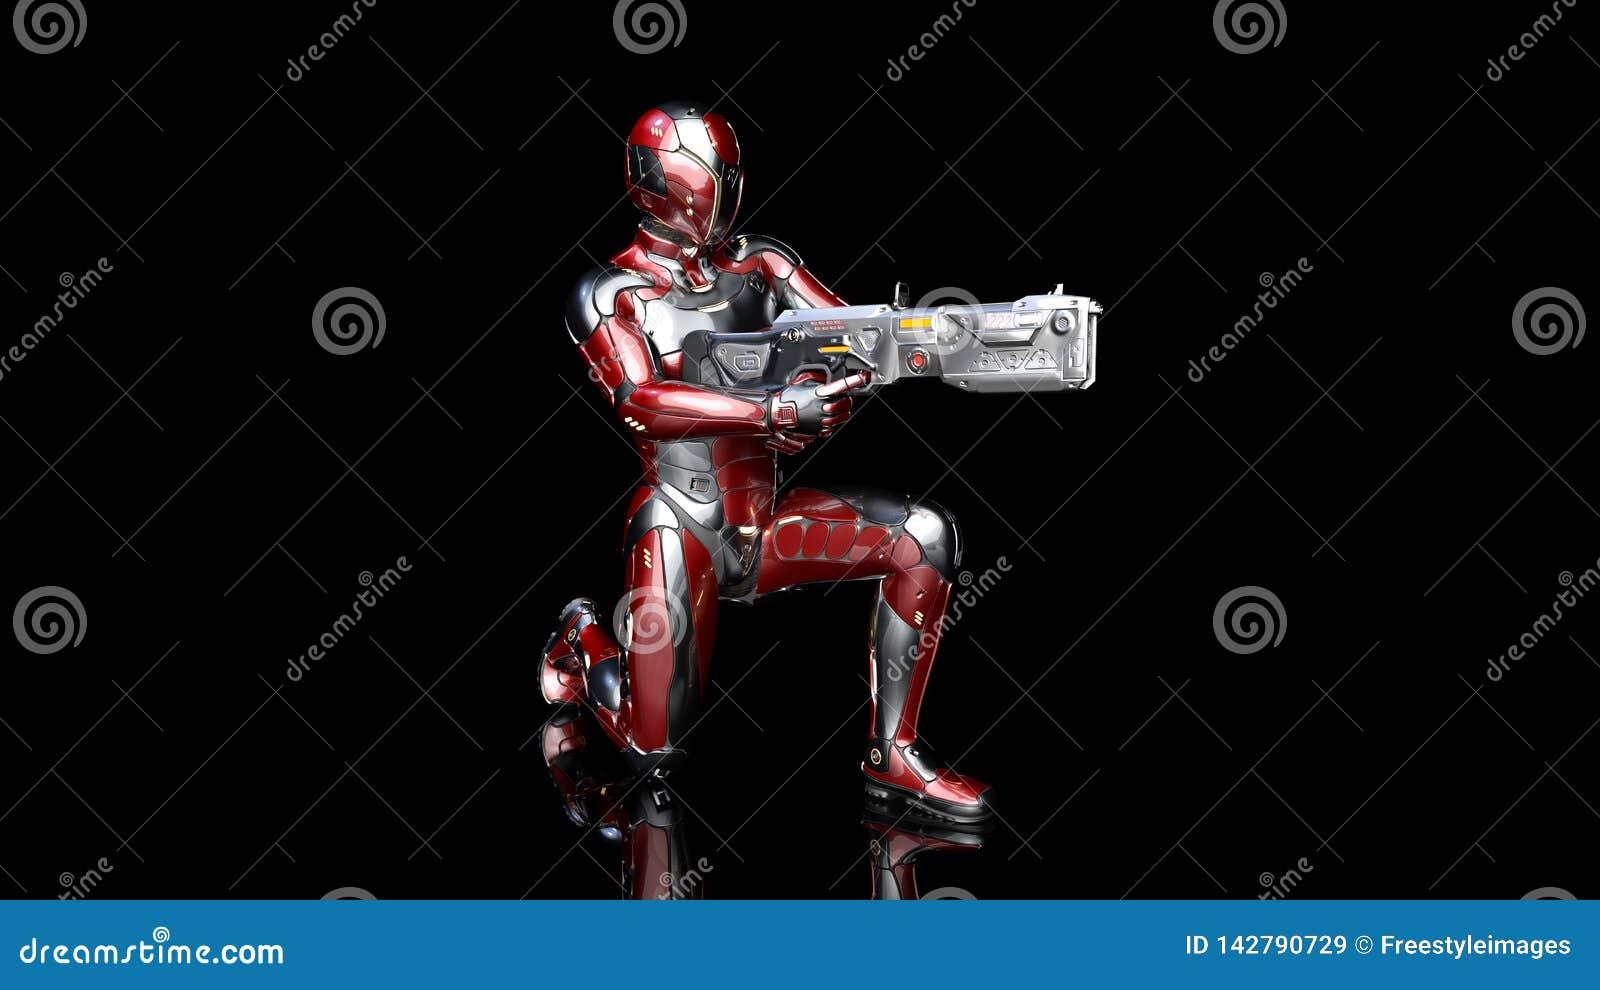 Futuristische androïde militair in kogelvrij pantser, militaire die cyborg met sc.i-FI geweerkanon wordt bewapend die op zwarte 3